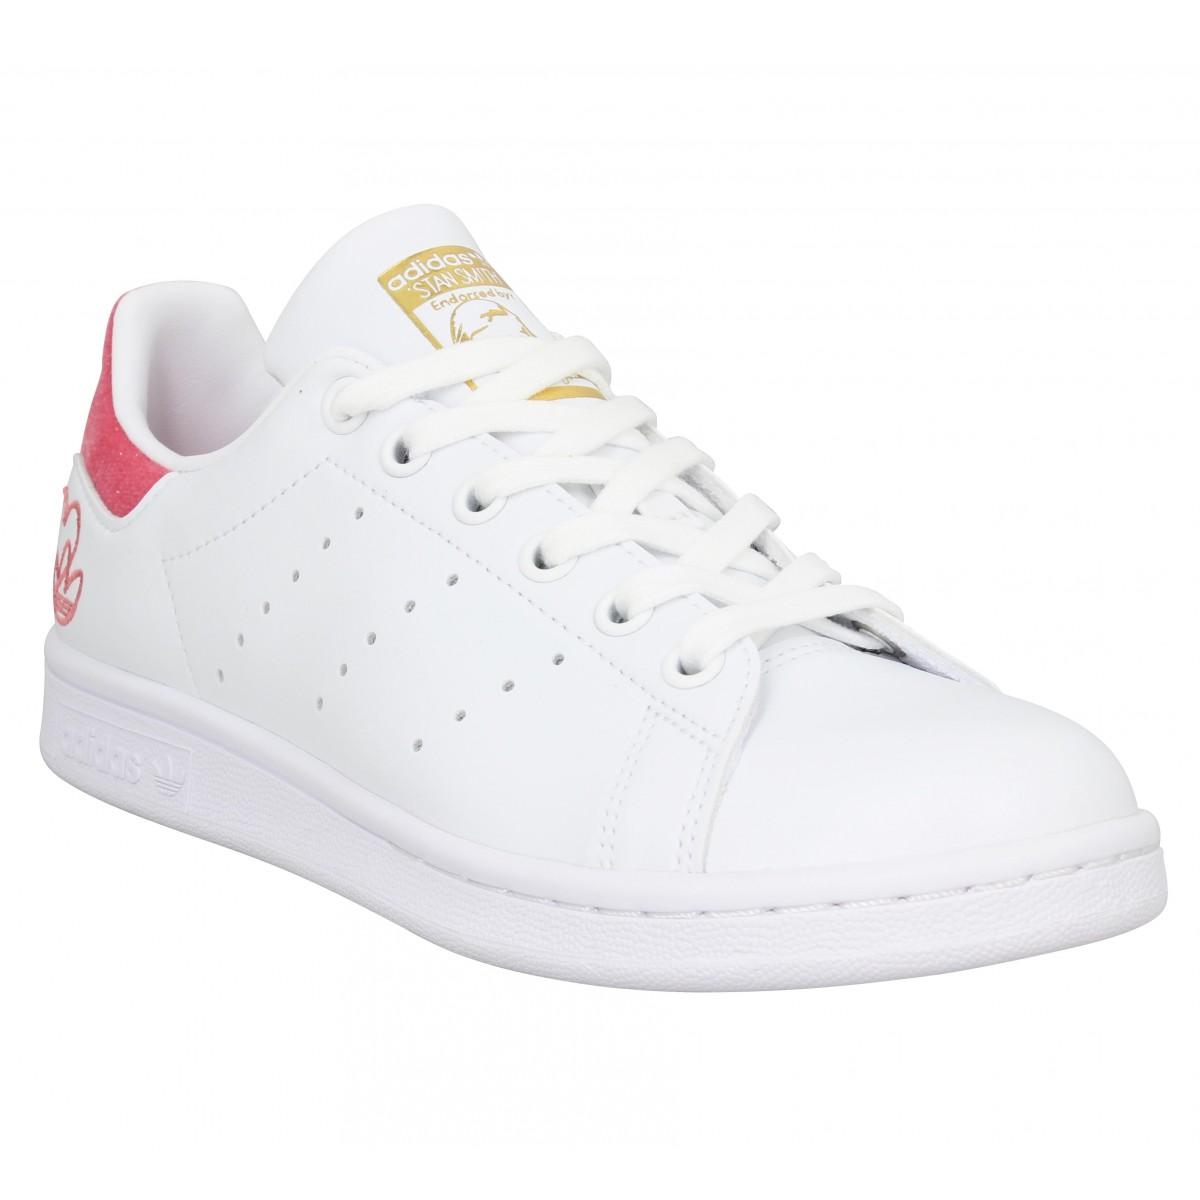 Chaussures Adidas stan smith vegan femme blanc rose femme | Fanny ...